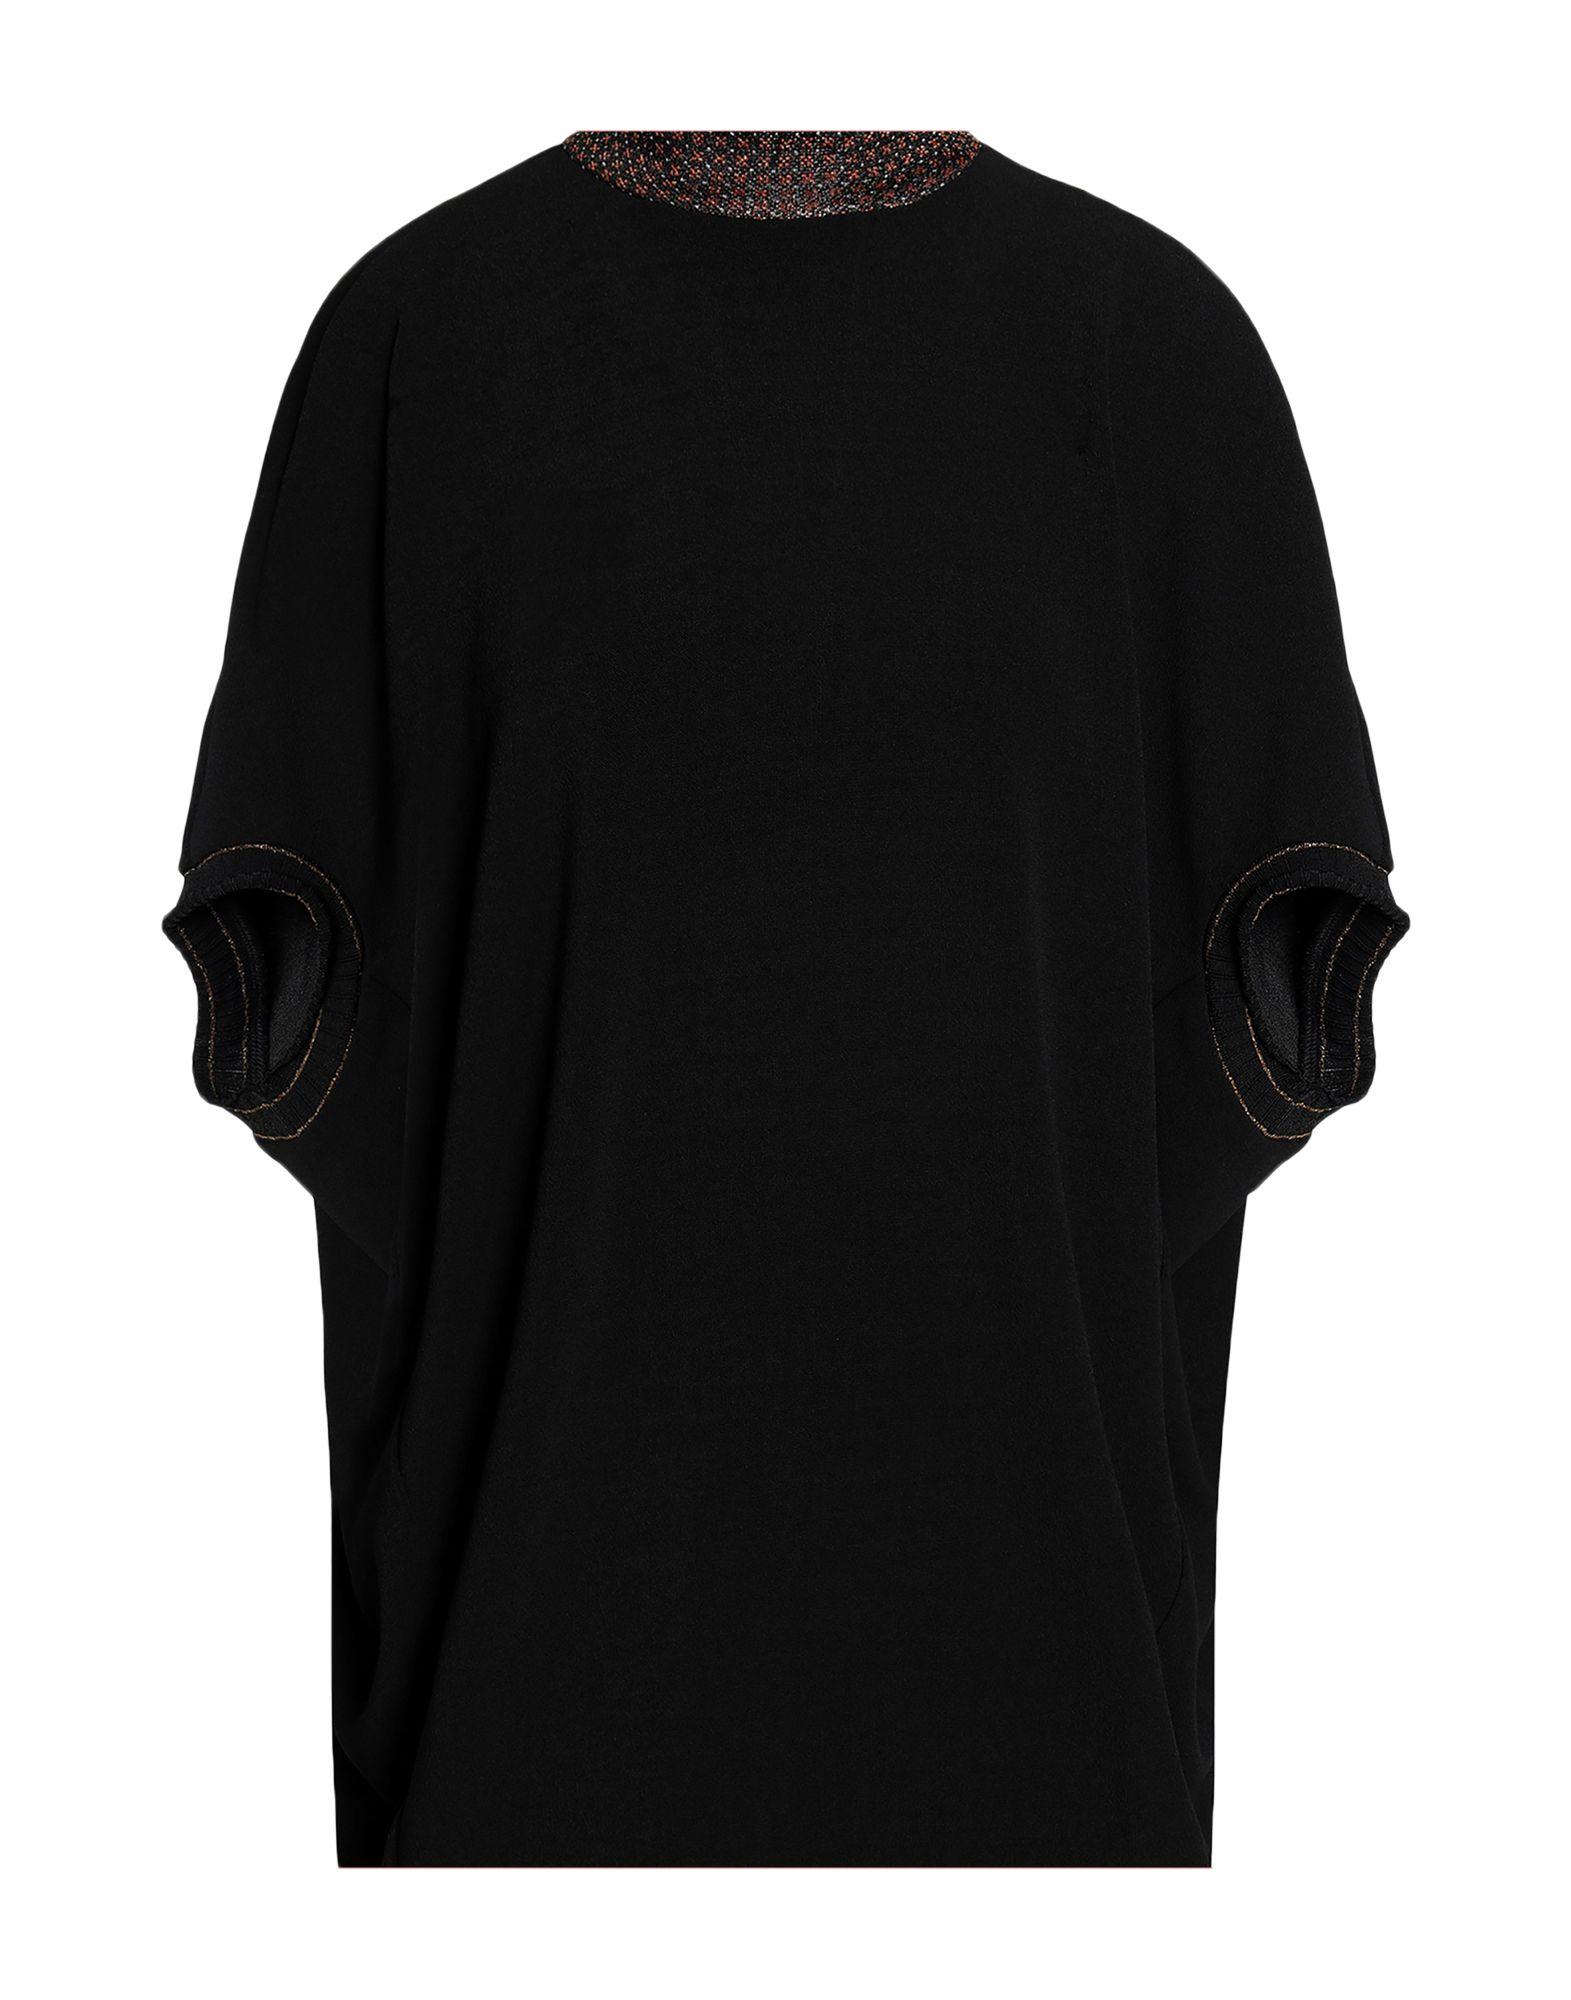 купить BY MALENE BIRGER Блузка по цене 9950 рублей